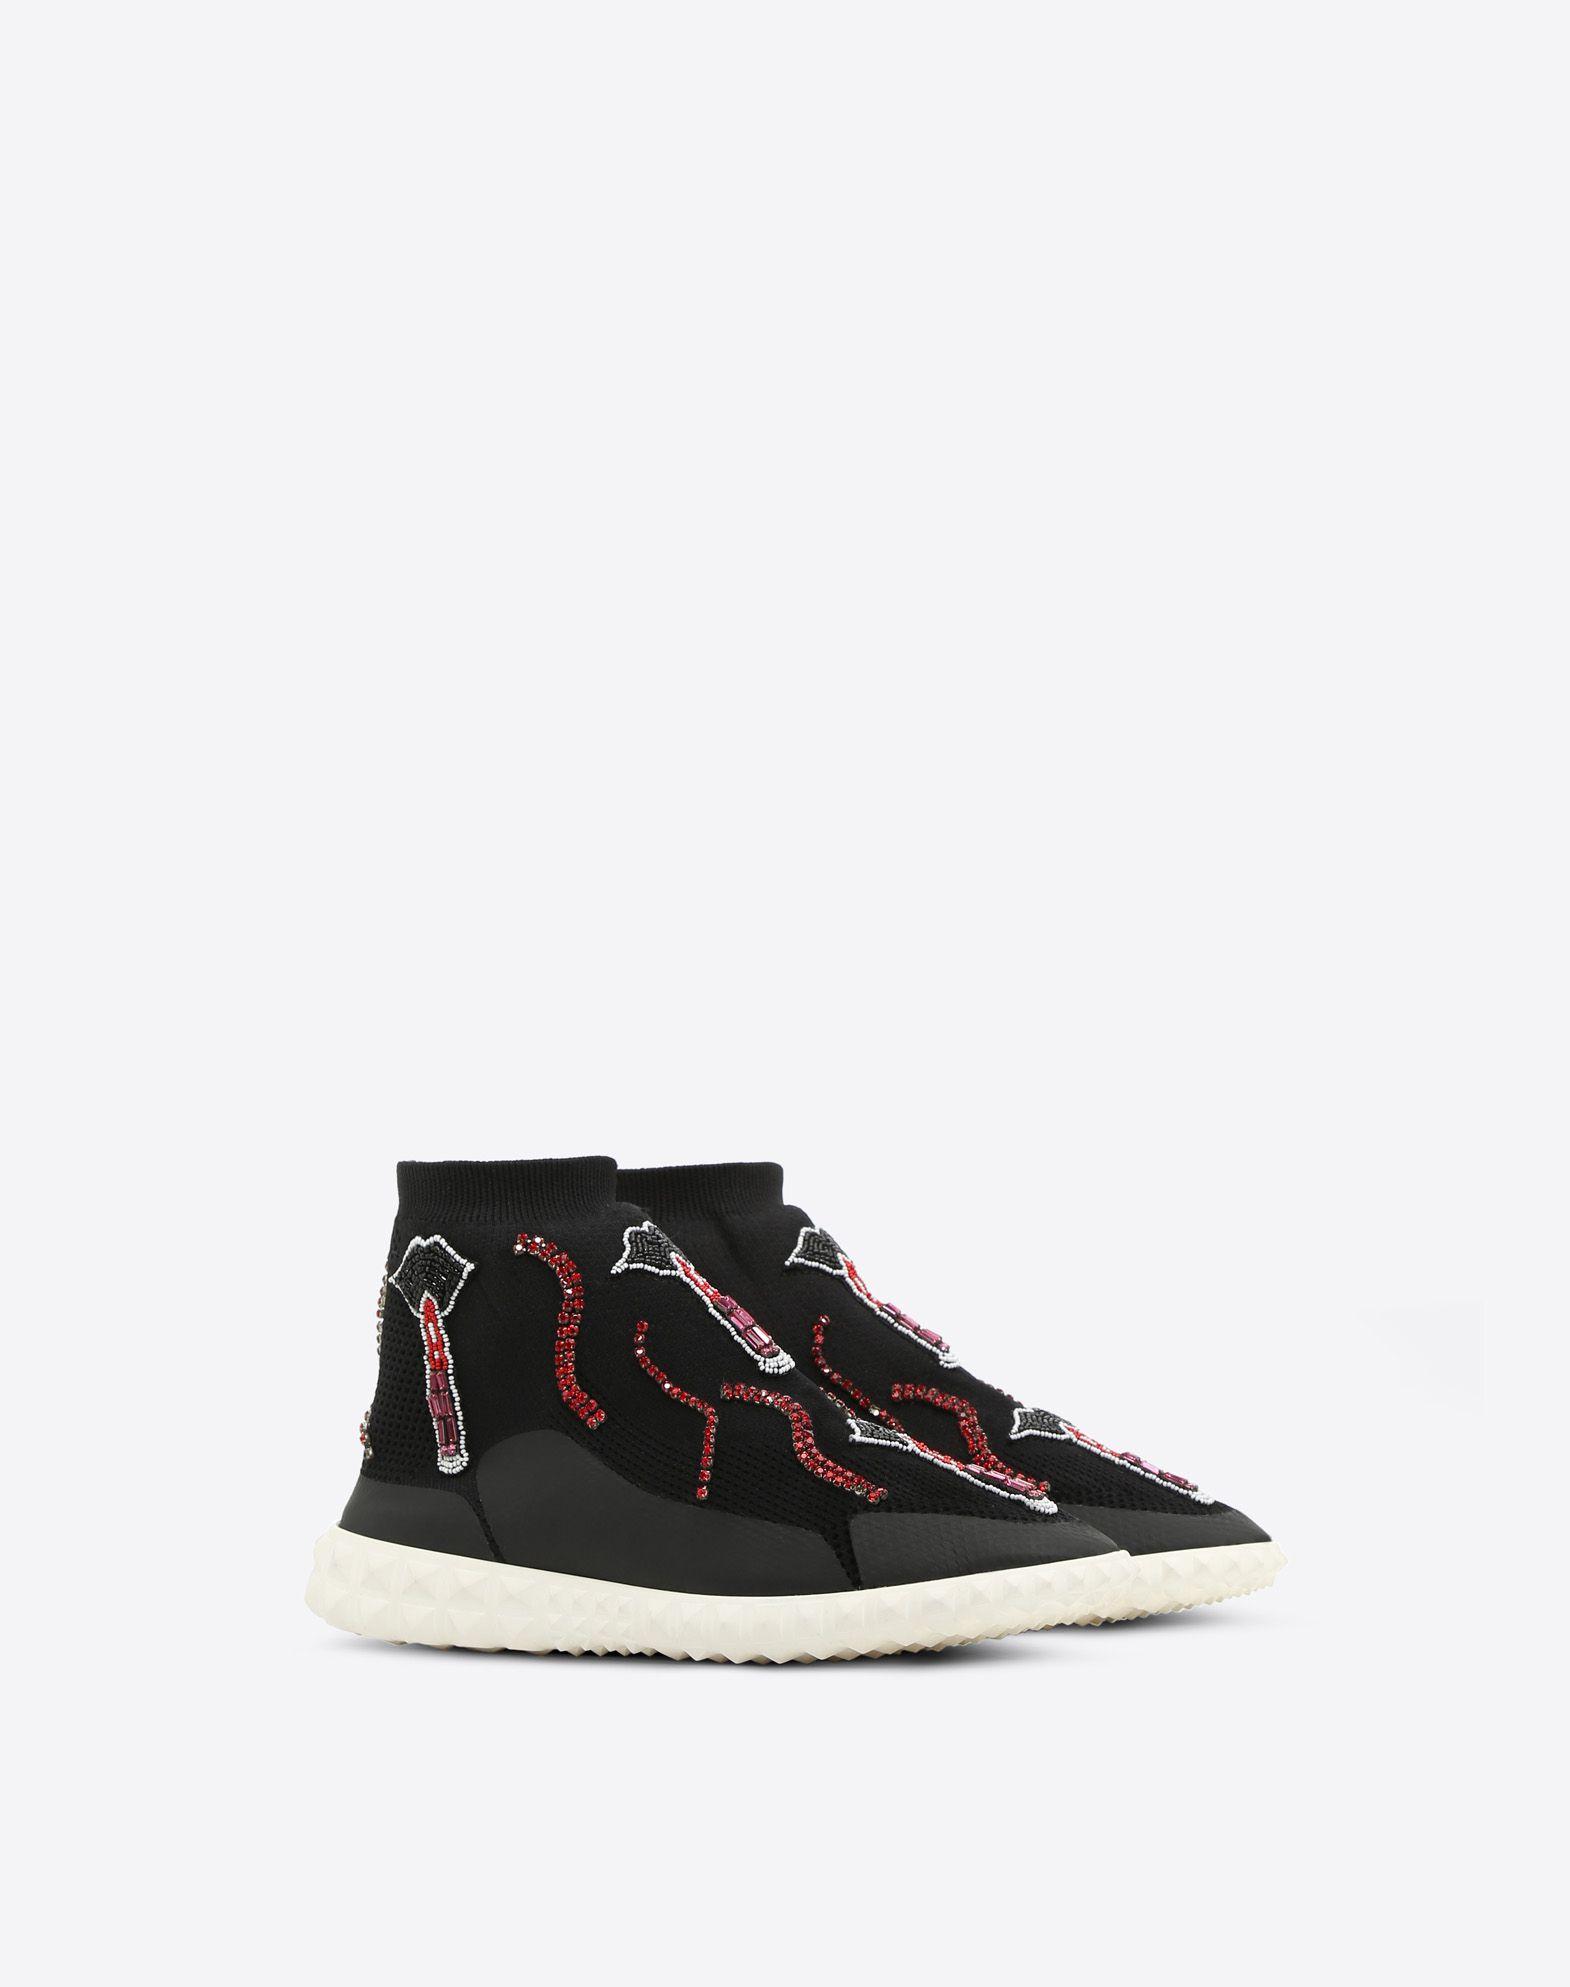 VALENTINO GARAVANI Embroidered Sneaker HIGH-TOP SNEAKER D r